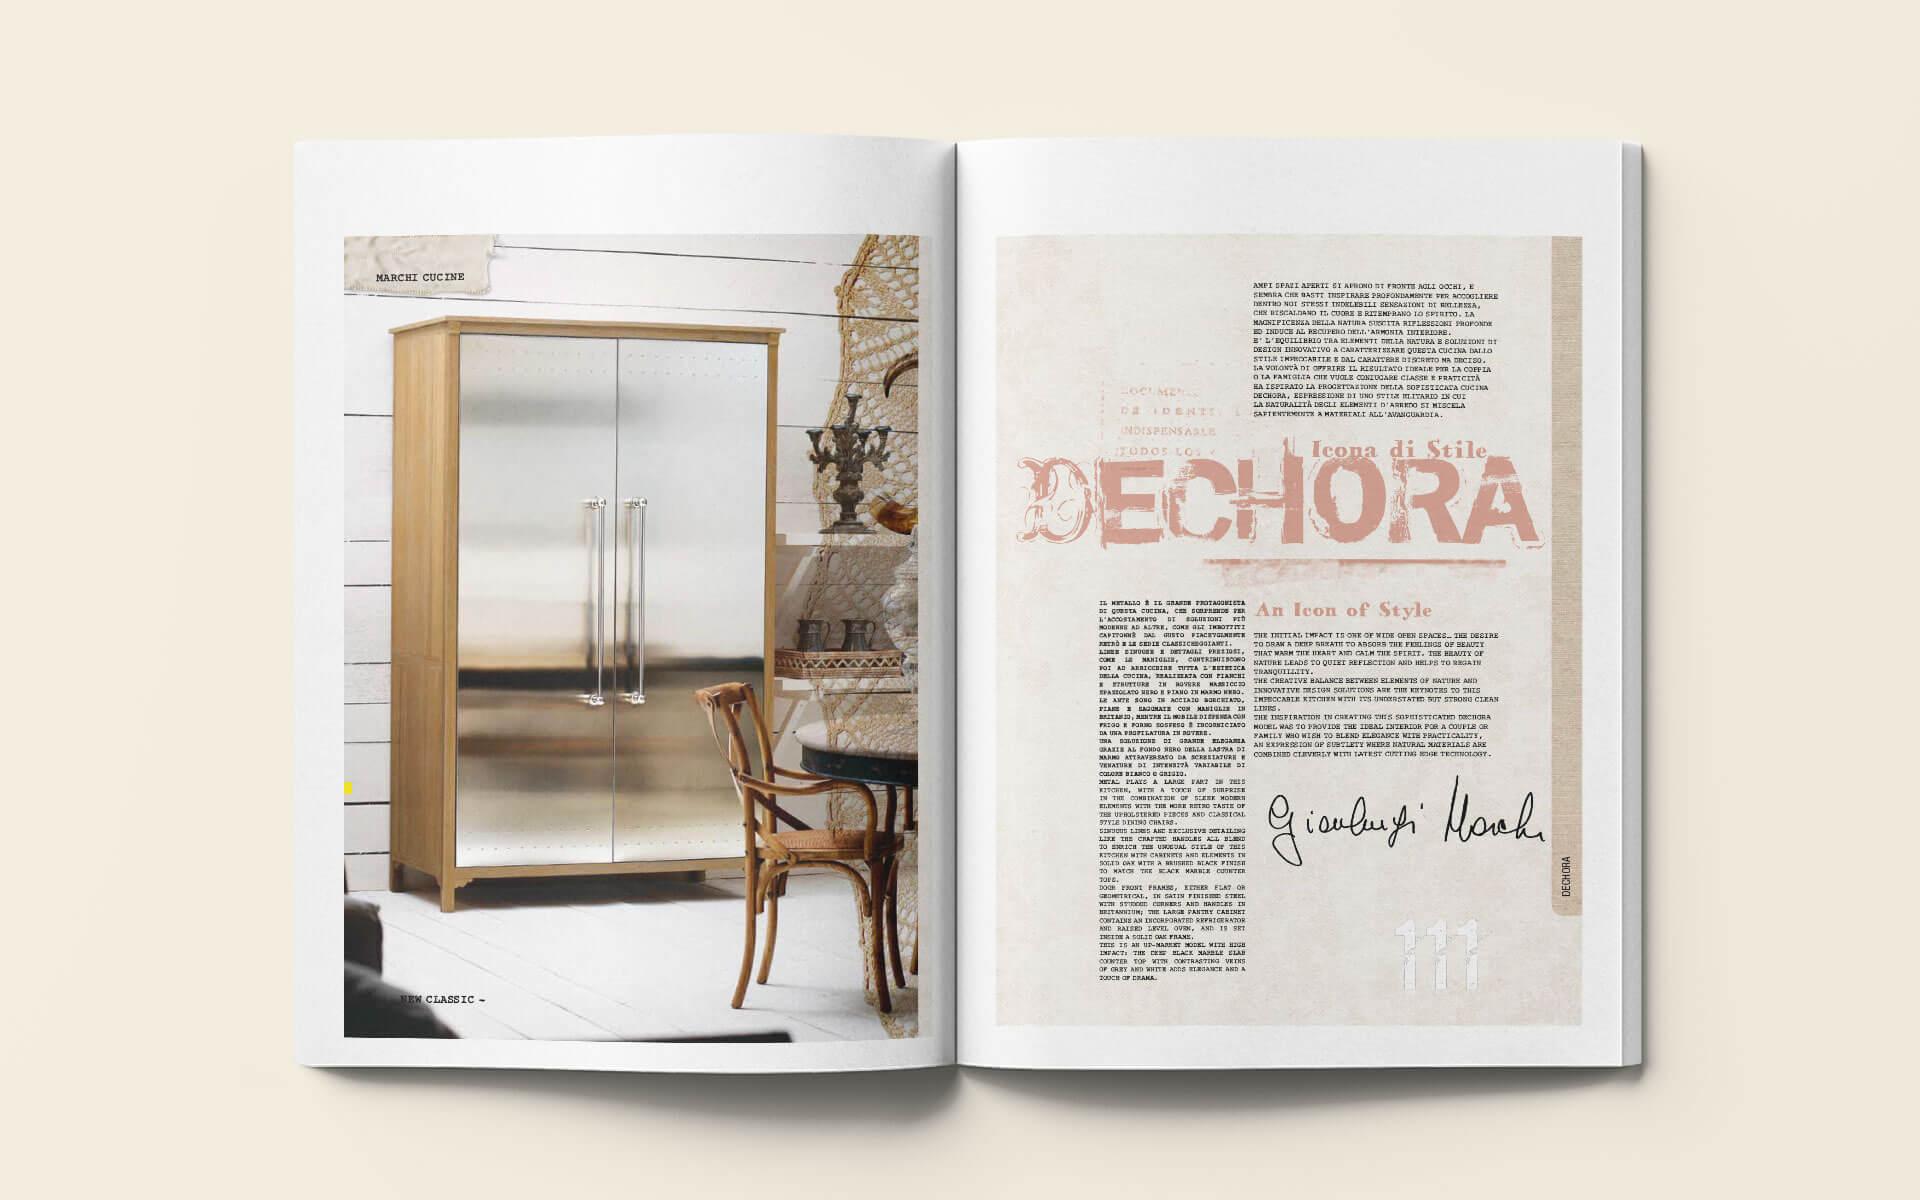 Catalogo Dechora - Marchi Cucine Made in Italy